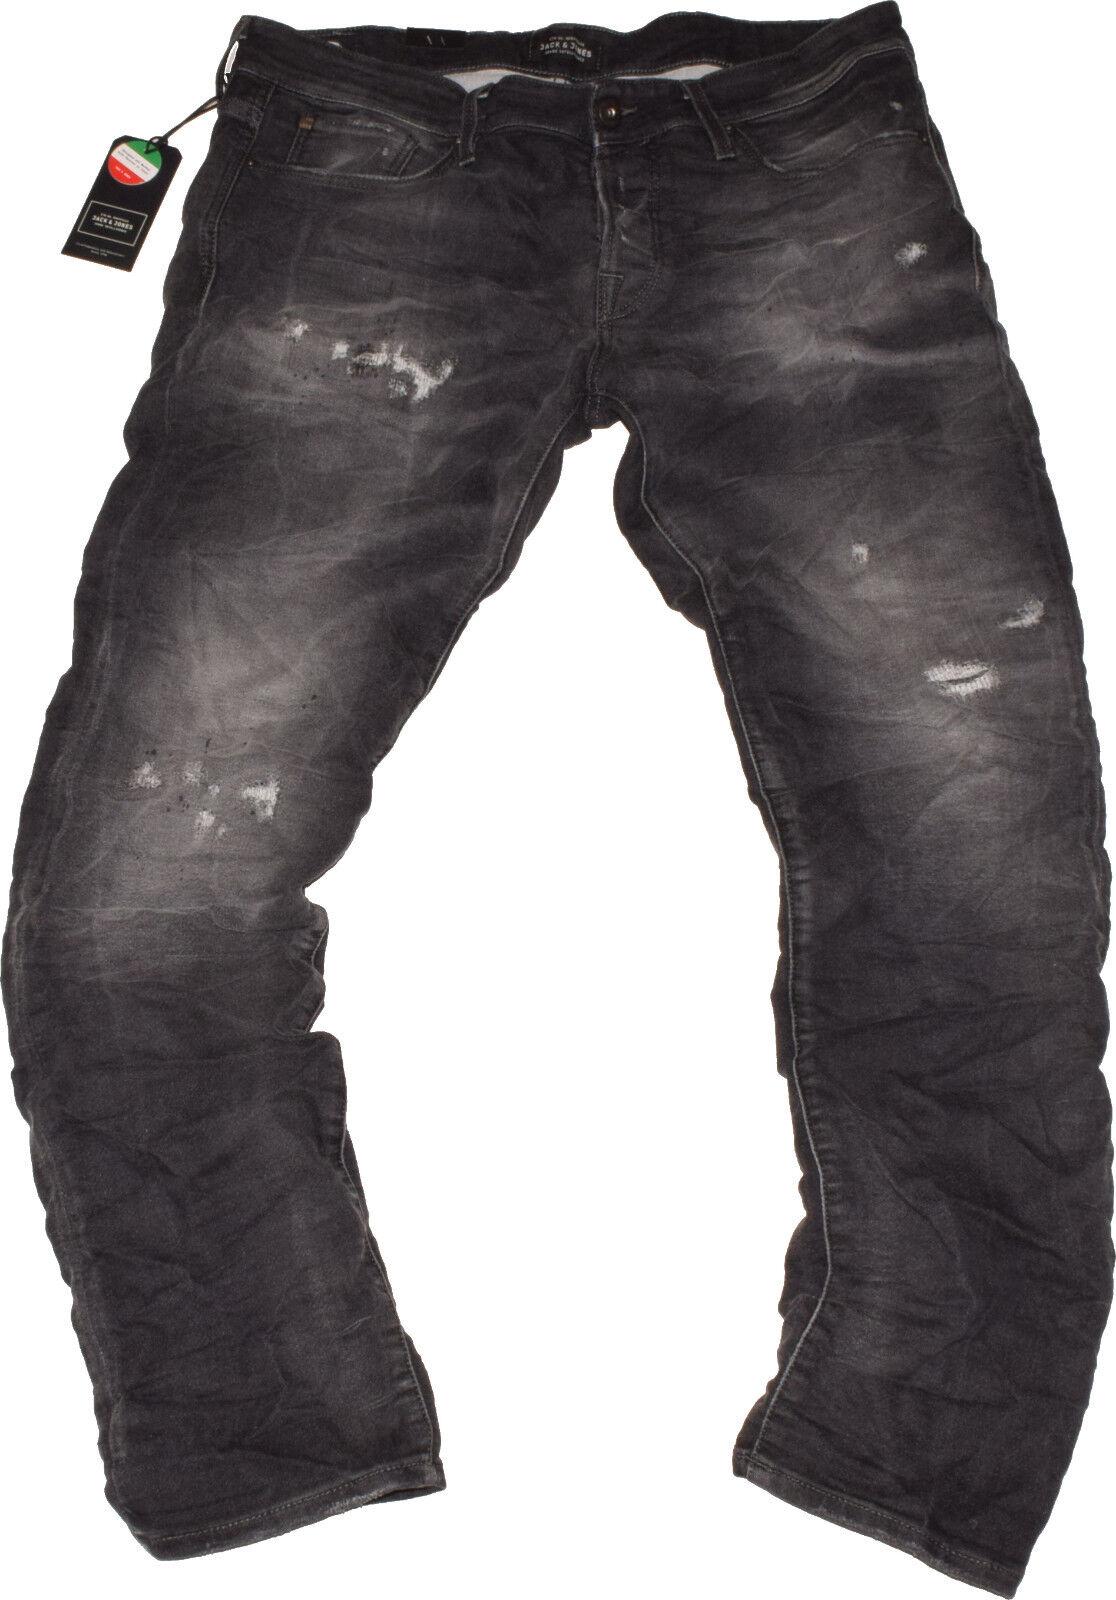 Jack & Jones Glenn Slim Fit Jeans STRETCH EFFETTO VISSUTO NUOVO